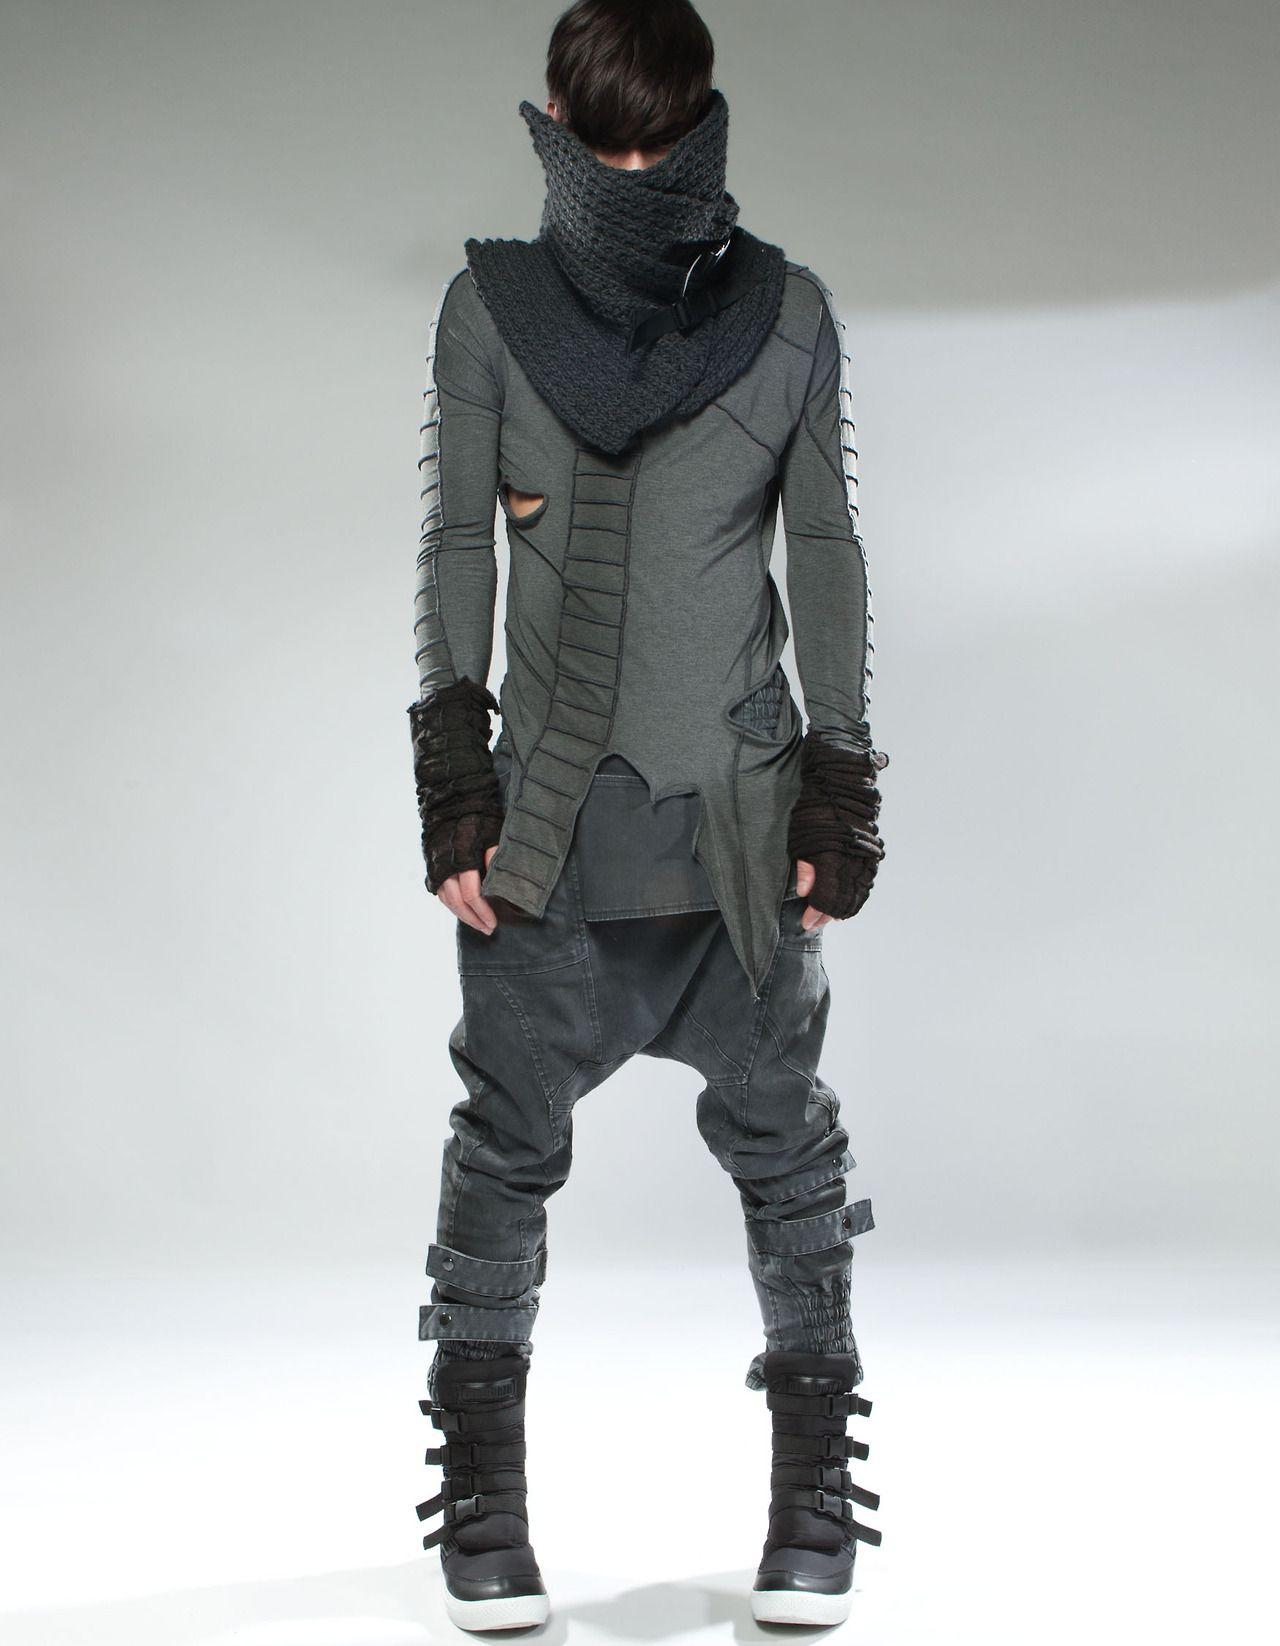 Futuristic Clothing, DEMOBAZA   для сеттинга   Pinterest   Fashion ... e9ecad5b981